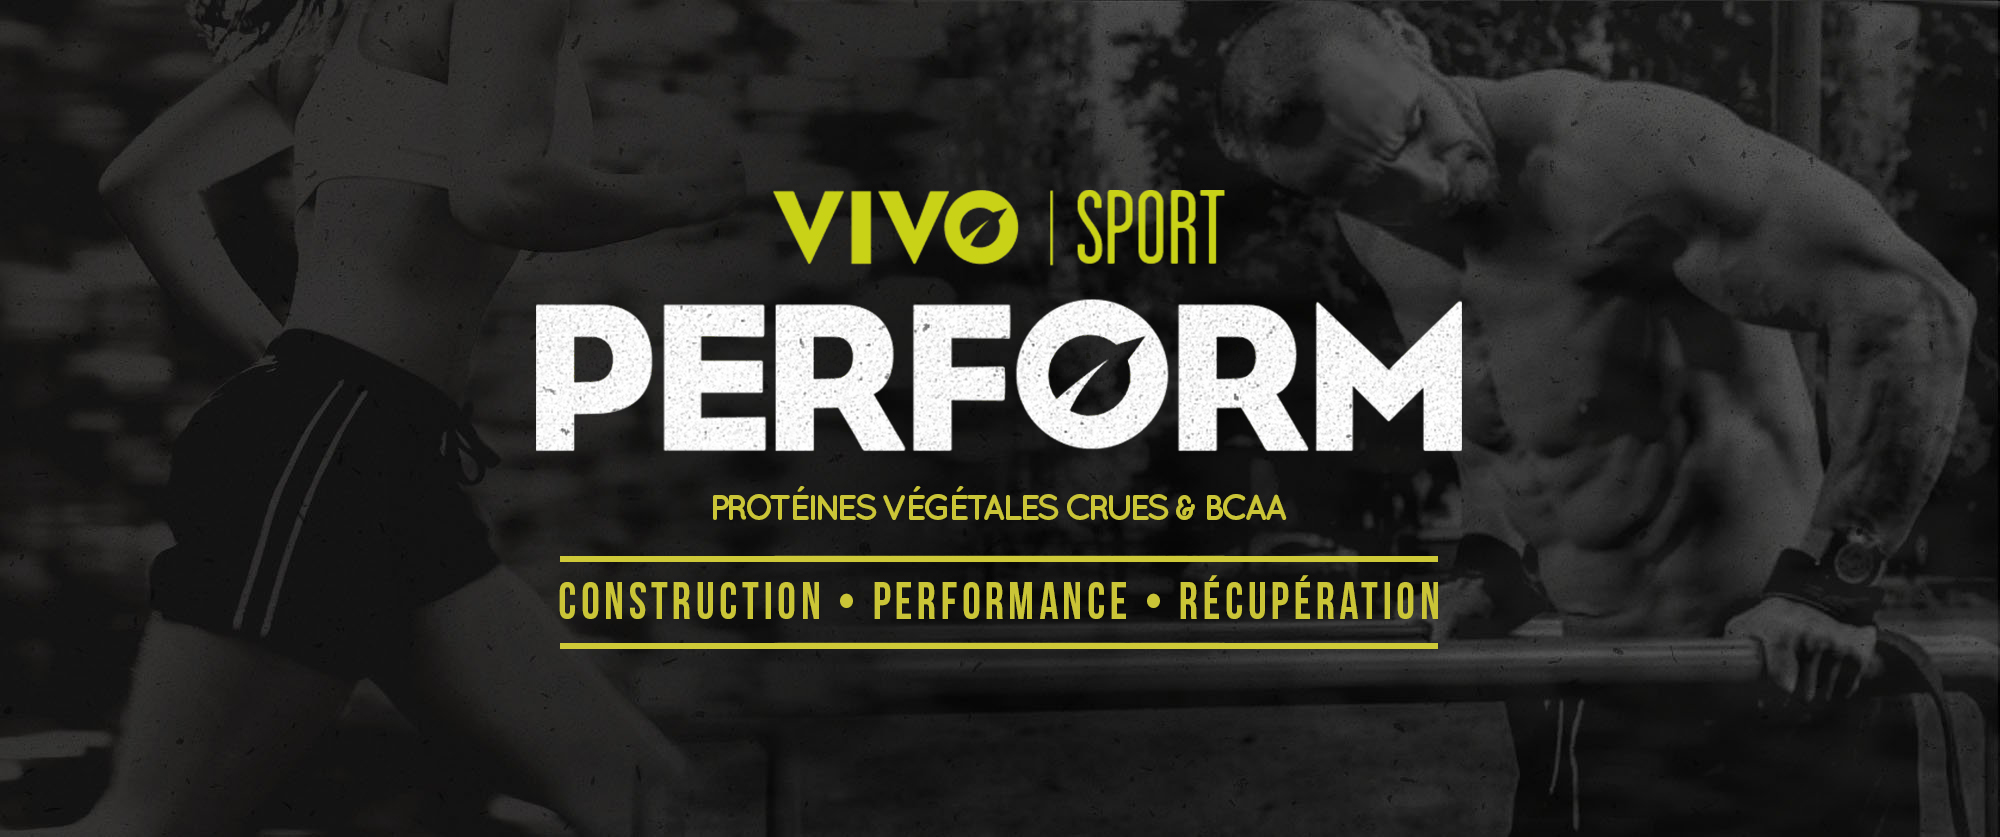 vivolife-perfom-construction-performance-récupération